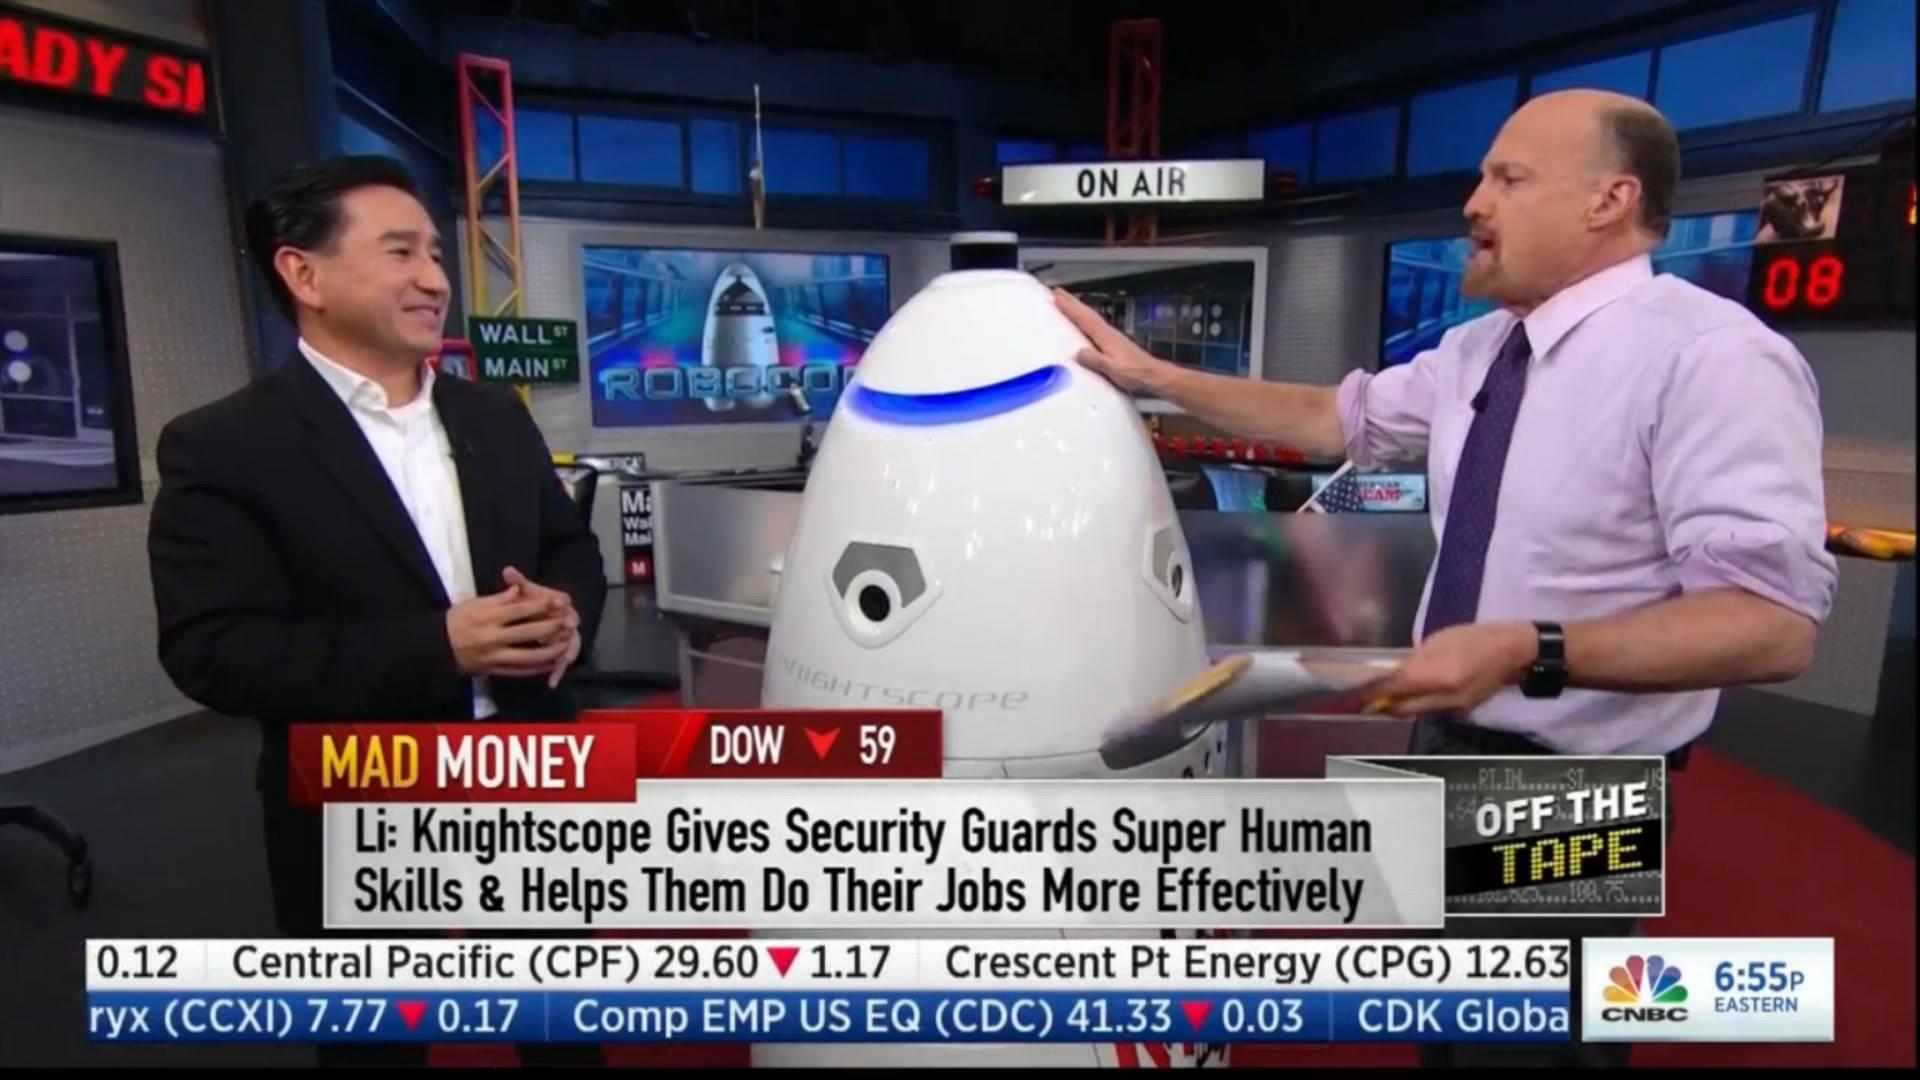 Knightscope Mad Money.jpg